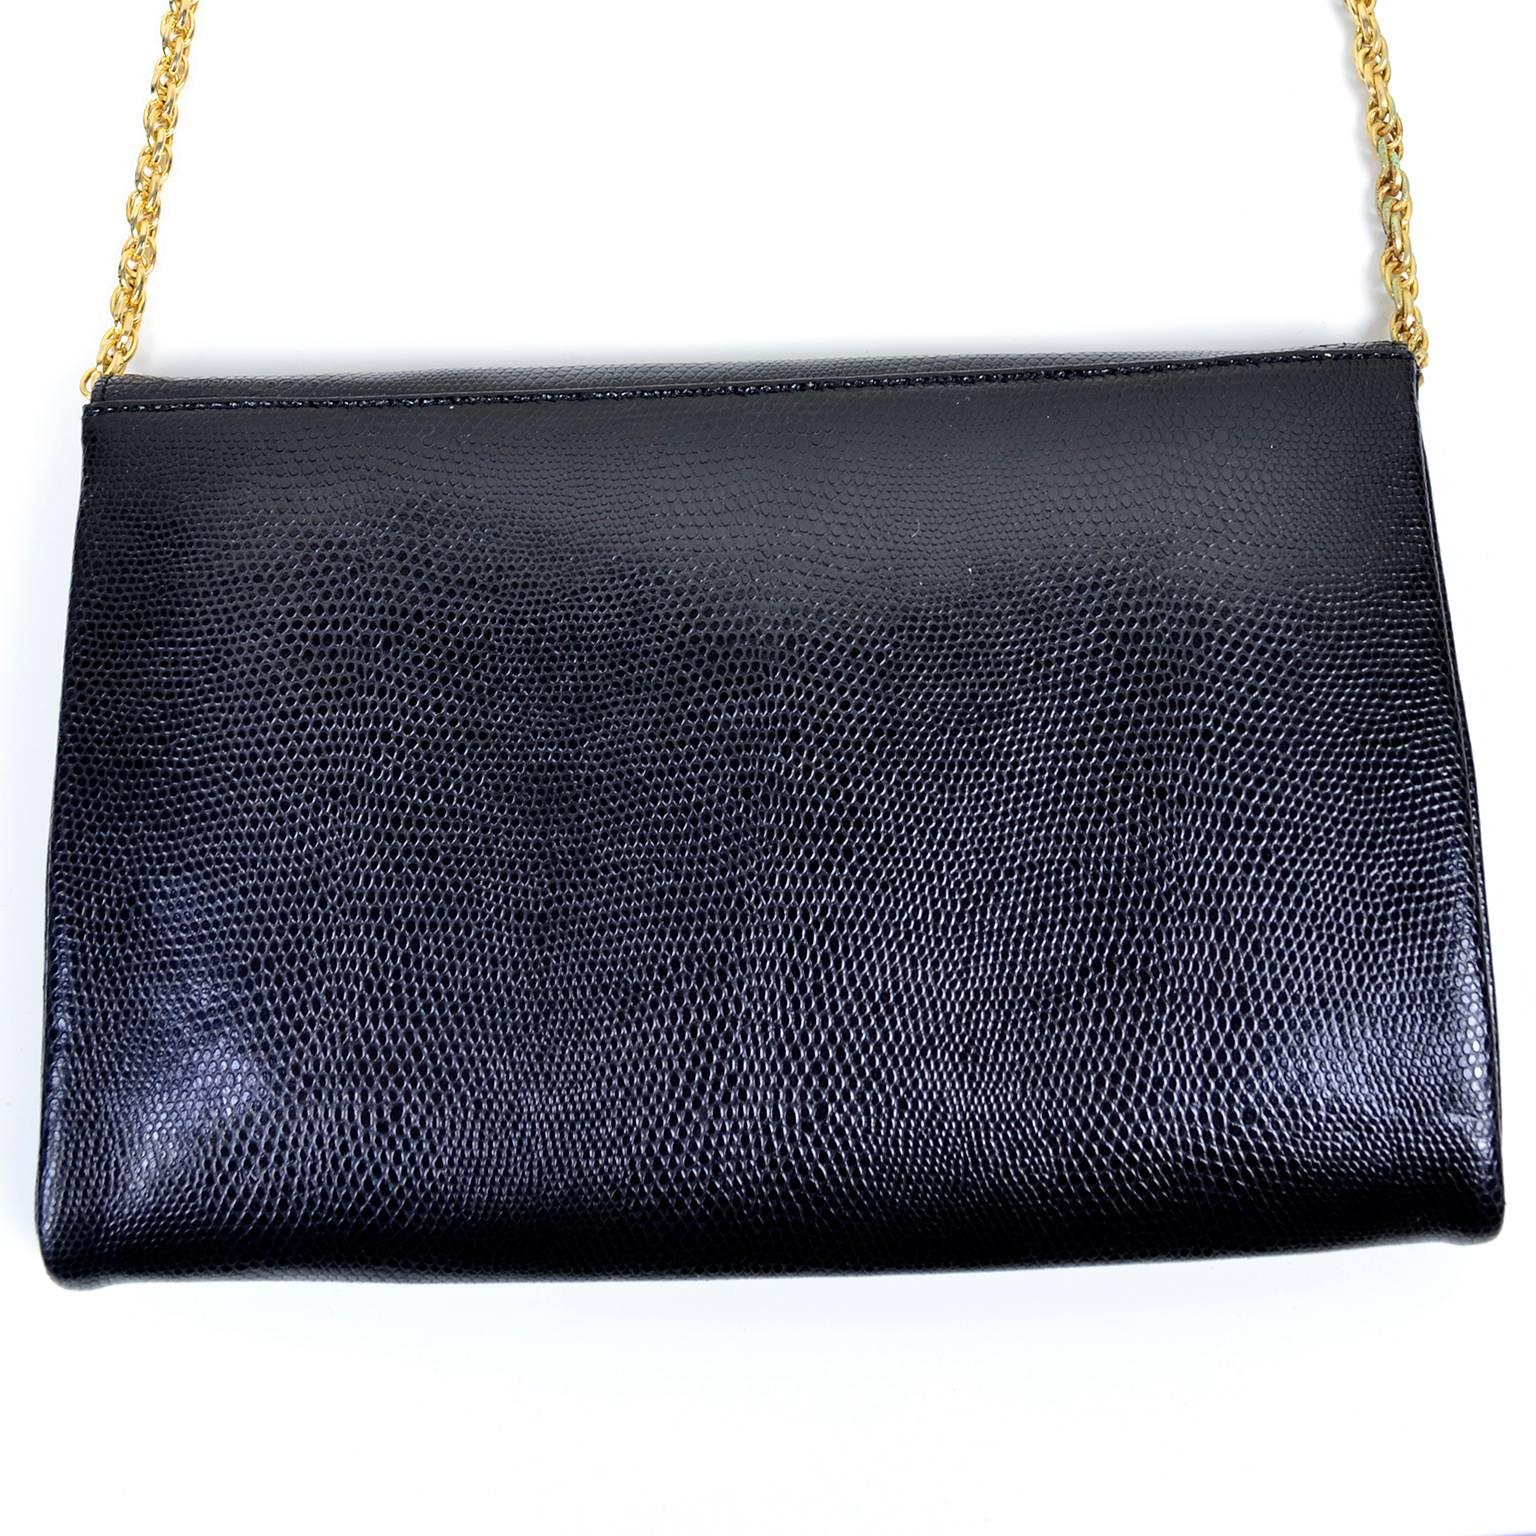 Rodo Italy Vintage Reptile Embossed Black Leather Handbag W/ Rhinestone Clasp pGV0j2wZnz